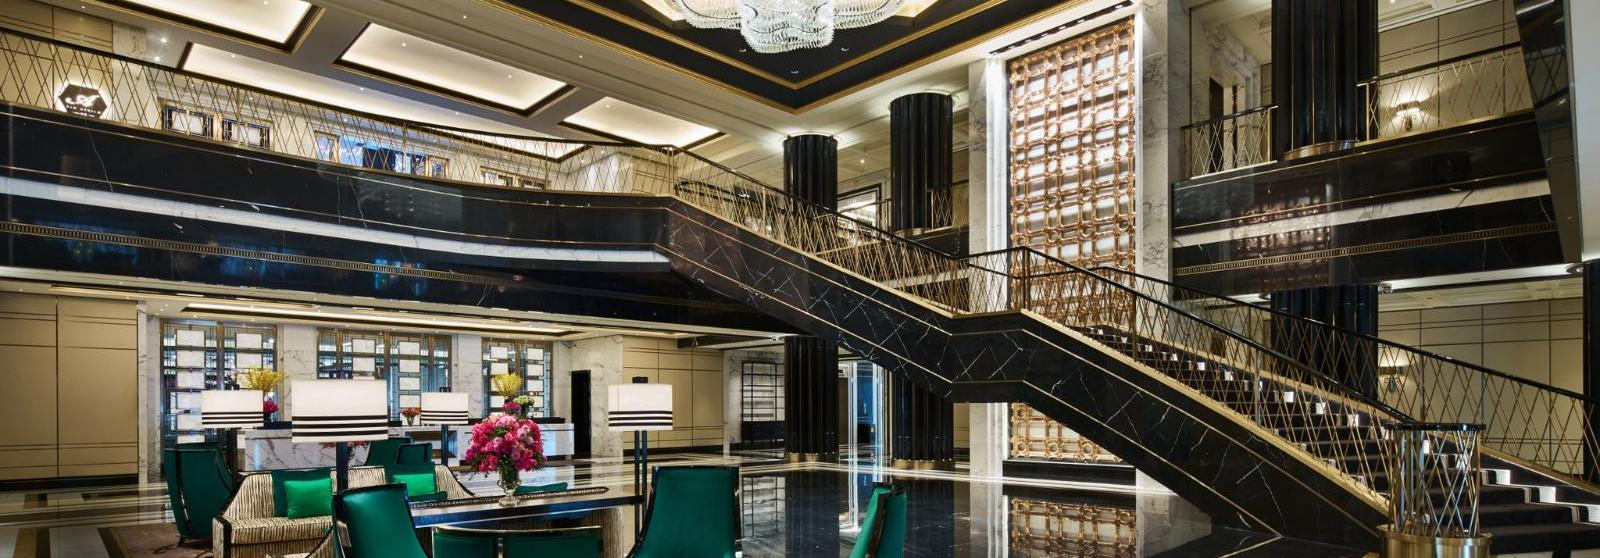 上海苏宁宝丽嘉酒店(Bellagio Shanghai) 图片  www.lhw.cn